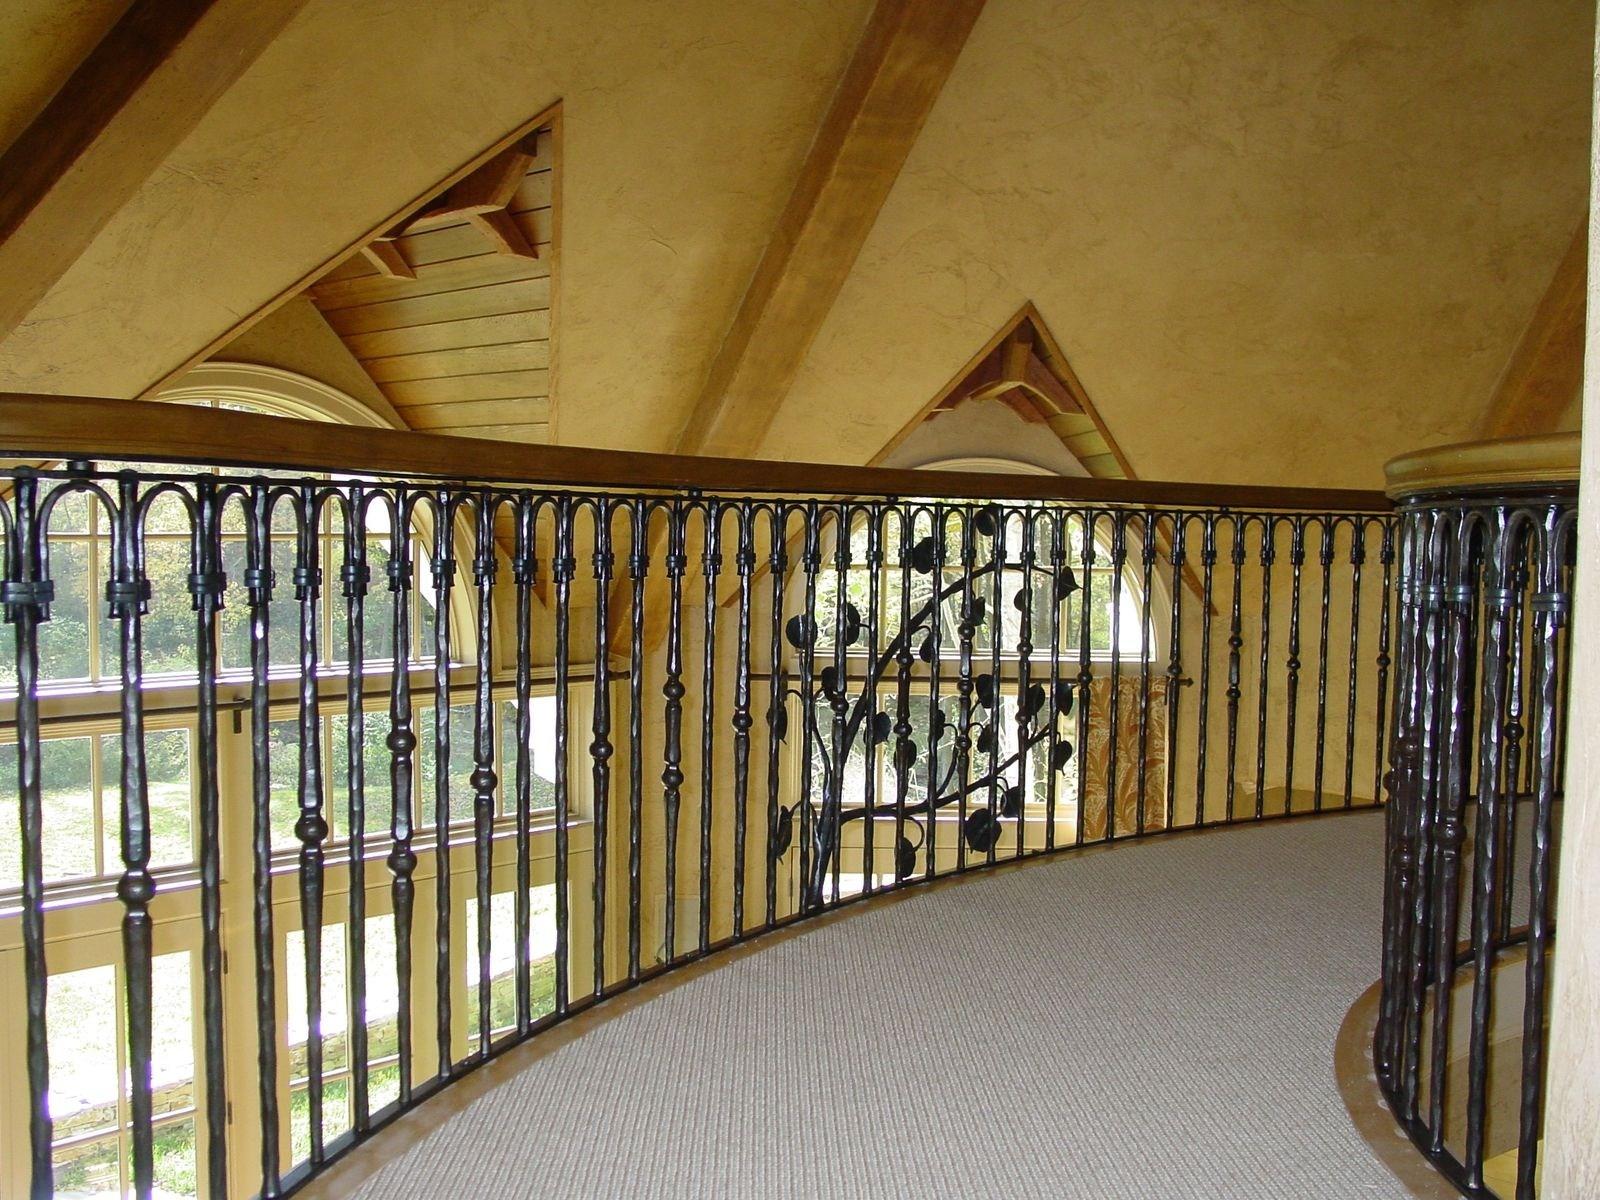 Custom Railings And Handrails Custommade Com | Wrought Iron Stair Railings Interior Cost | Wood | Cast Iron Spindles | Stair Spindles | Staircase Ideas | Iron Staircase Railings